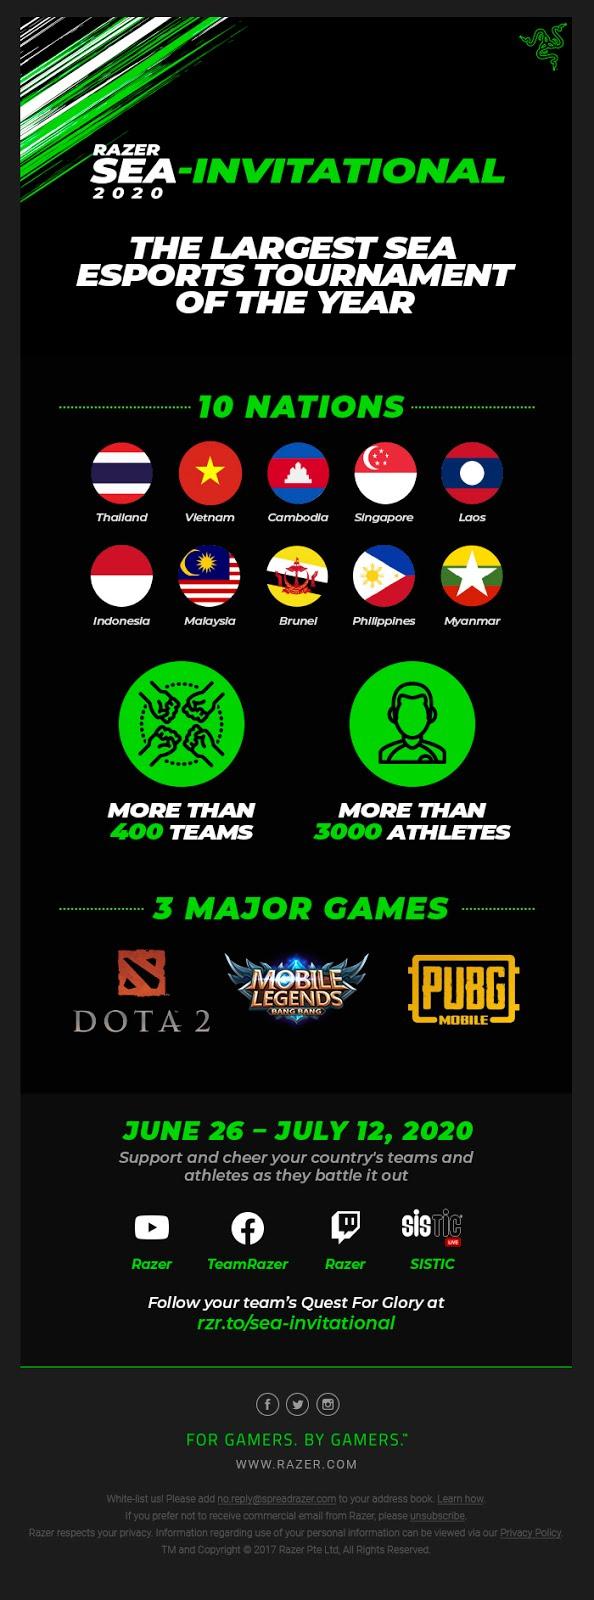 Razer Southeast Asian-Invitational 2020